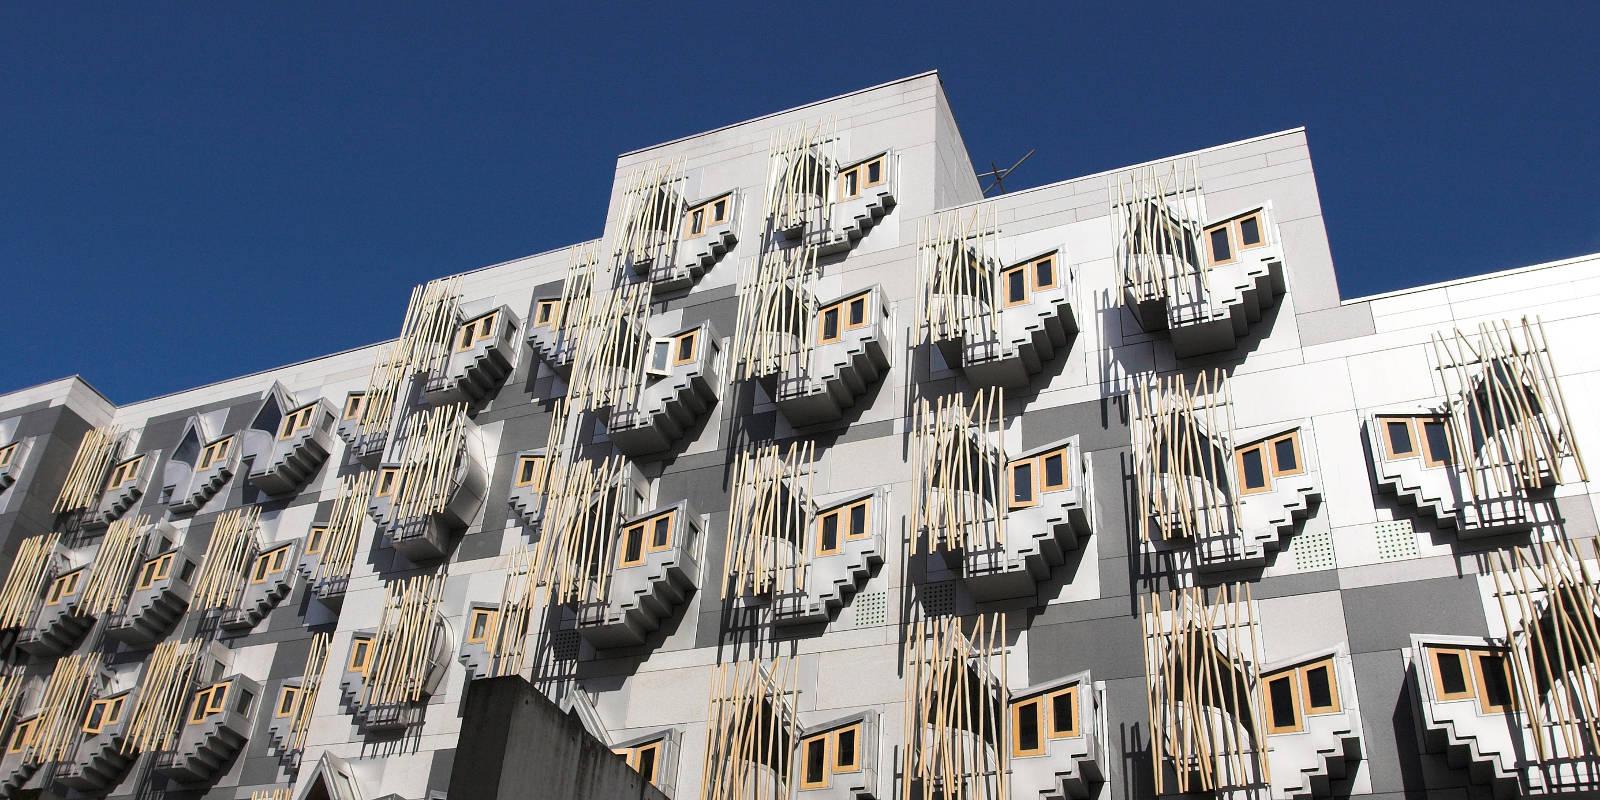 Close up of the Scottish Parliament Building in Edinburgh